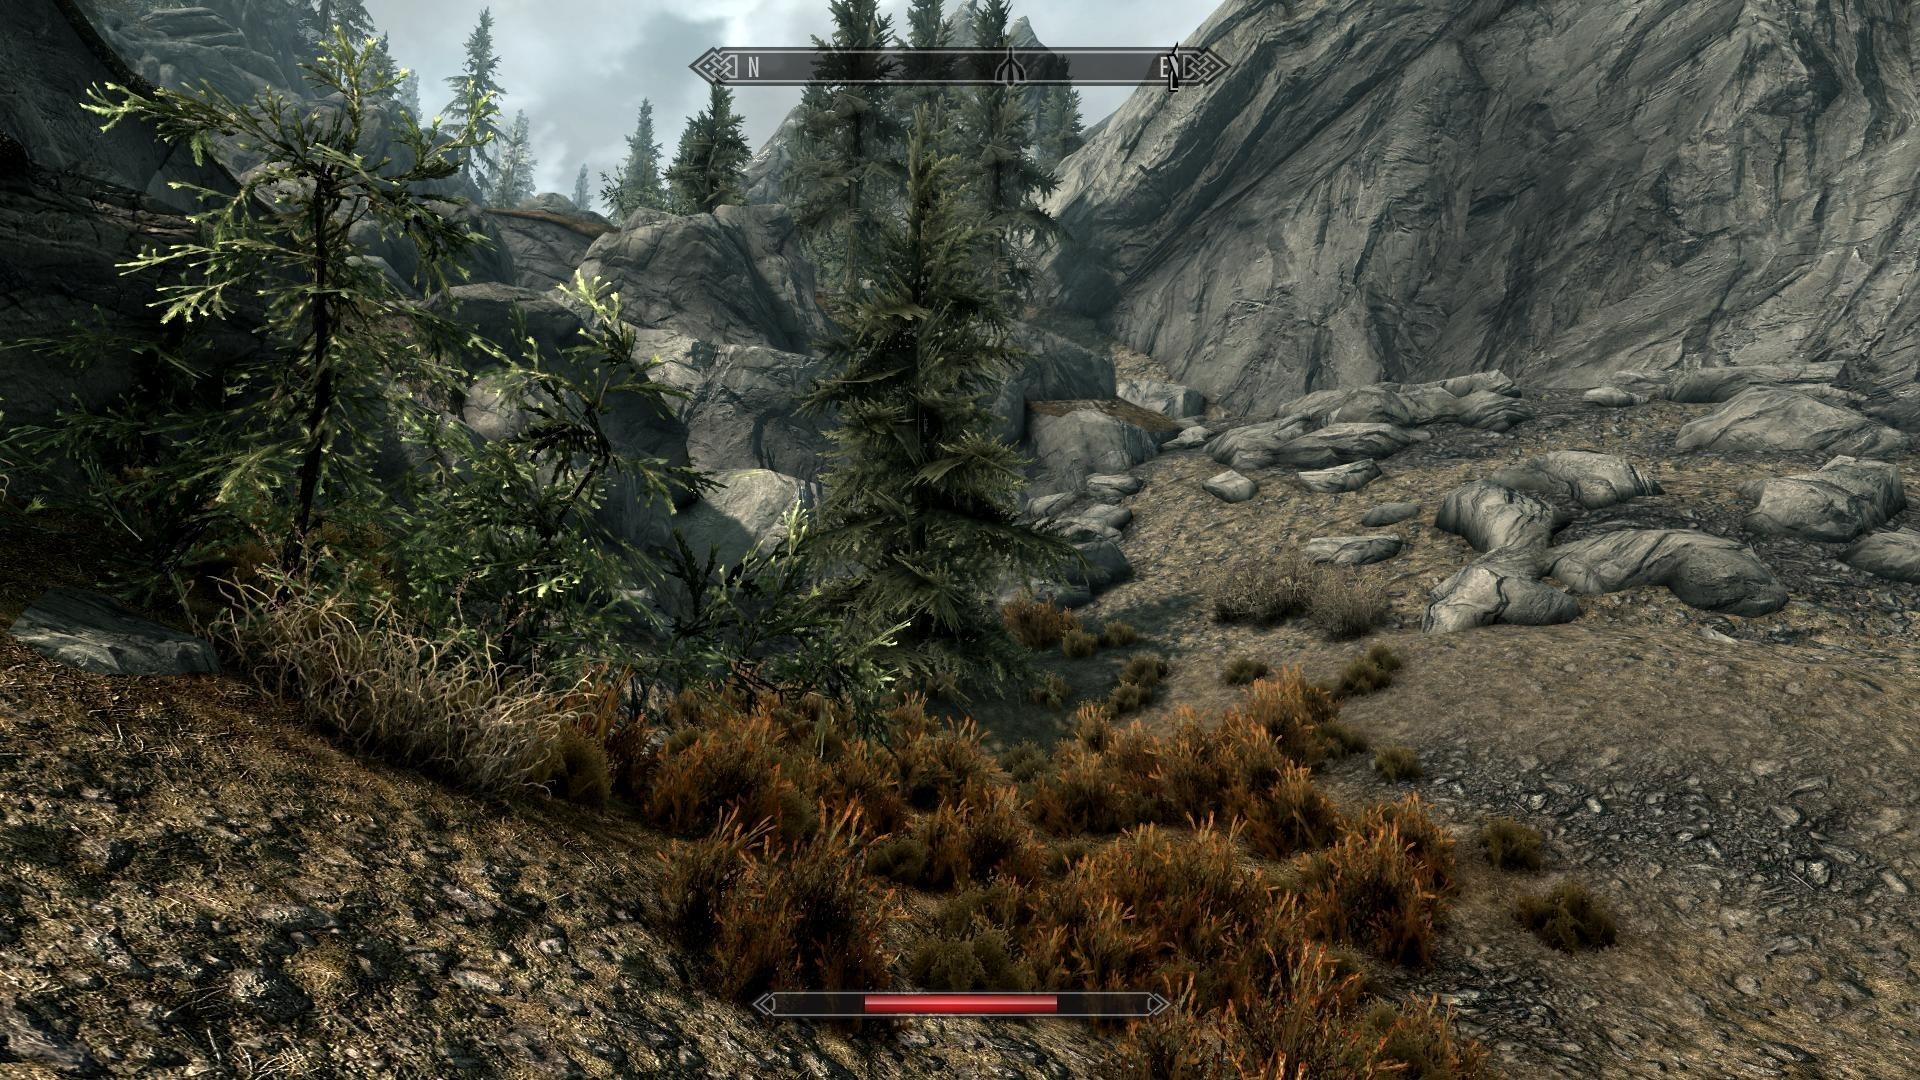 The Elder Scrolls 5: Skyrim tunen Grafik per Ini Datei und